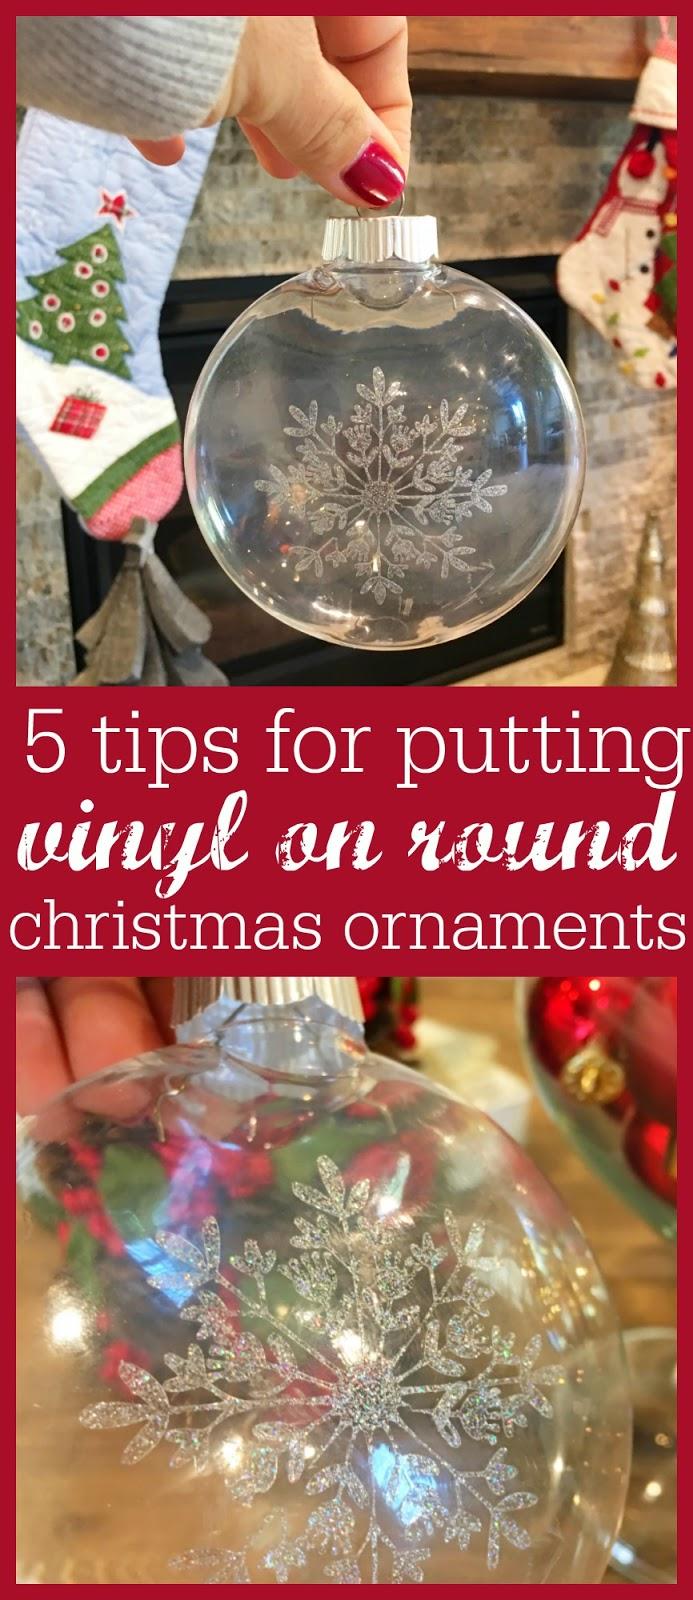 5 Tricks To Putting Vinyl Designs On Round Christmas Ornaments Silhouette Video Tutorial Diy Christmas Ornaments Vinyl Ornaments Cricut Ornaments